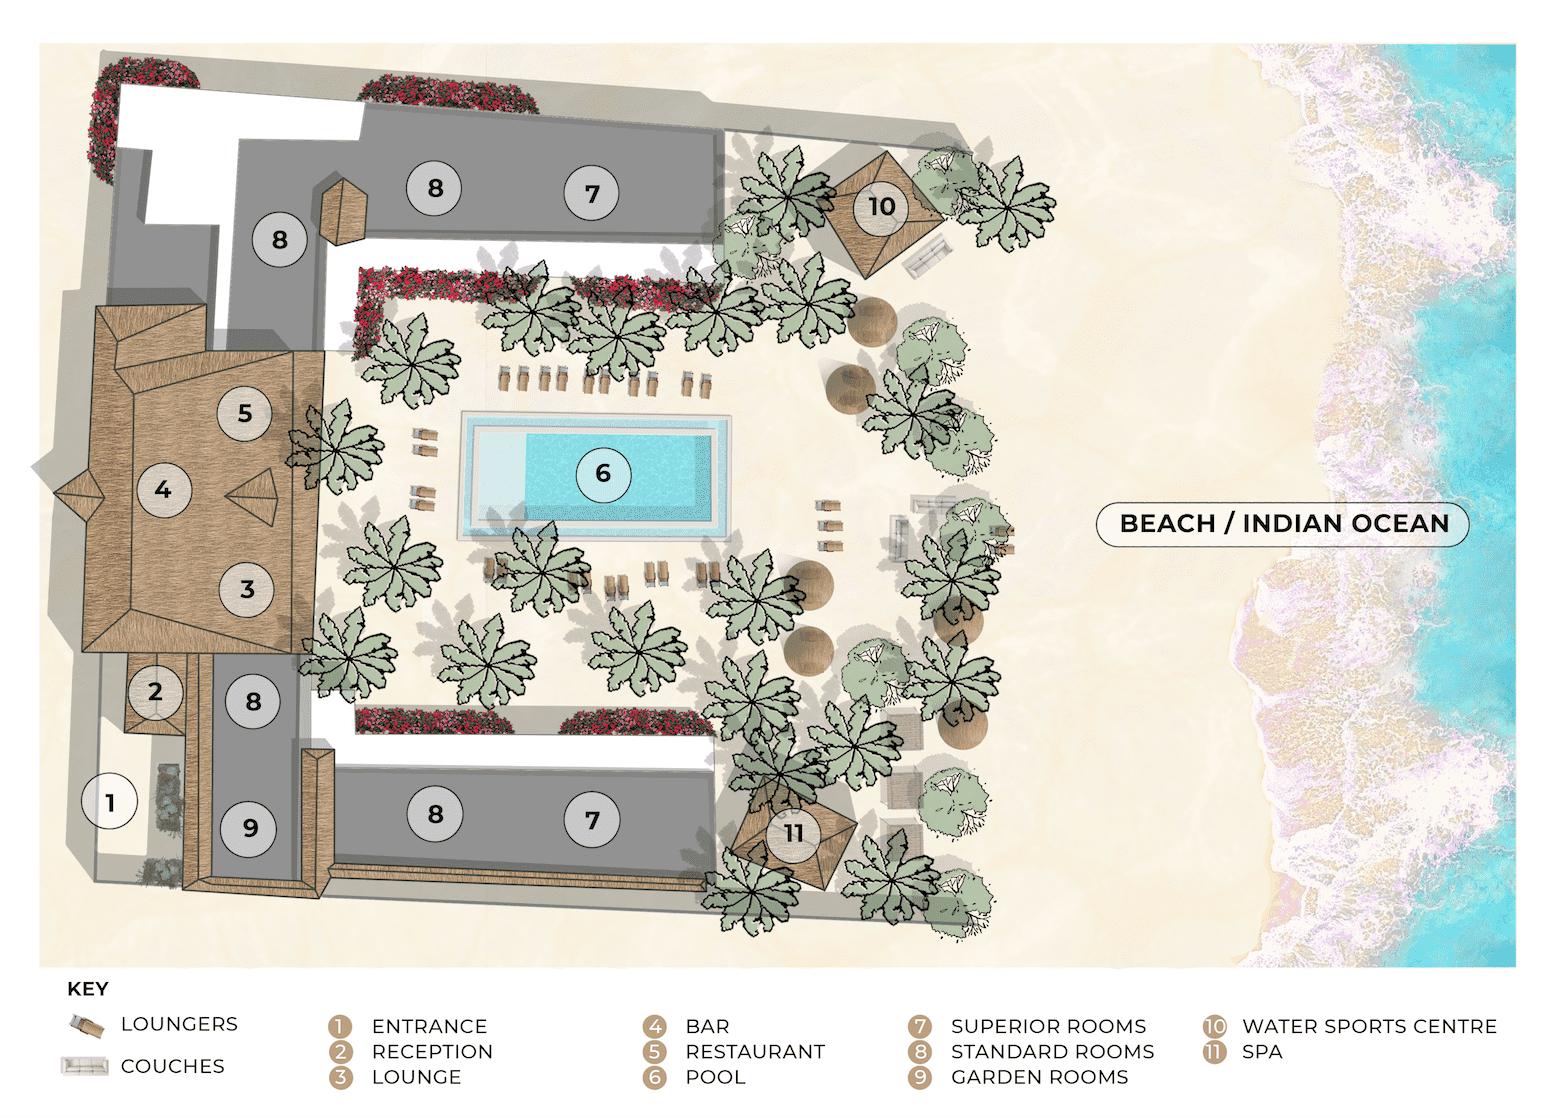 The Loop Beach Resort site map